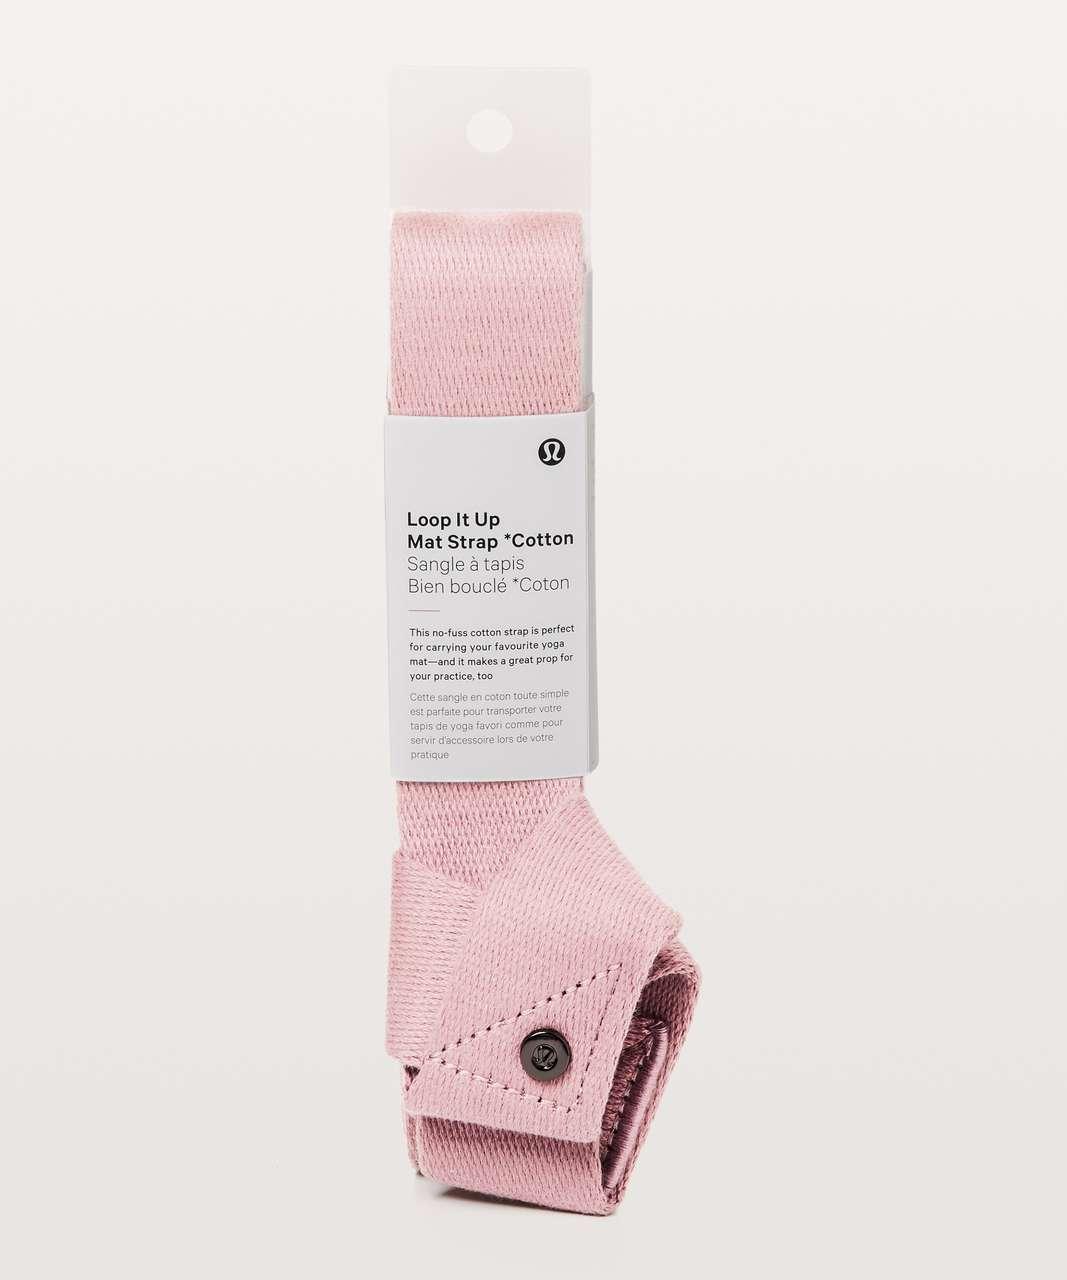 Lululemon Loop It Up Mat Strap Cotton - Light Quicksand